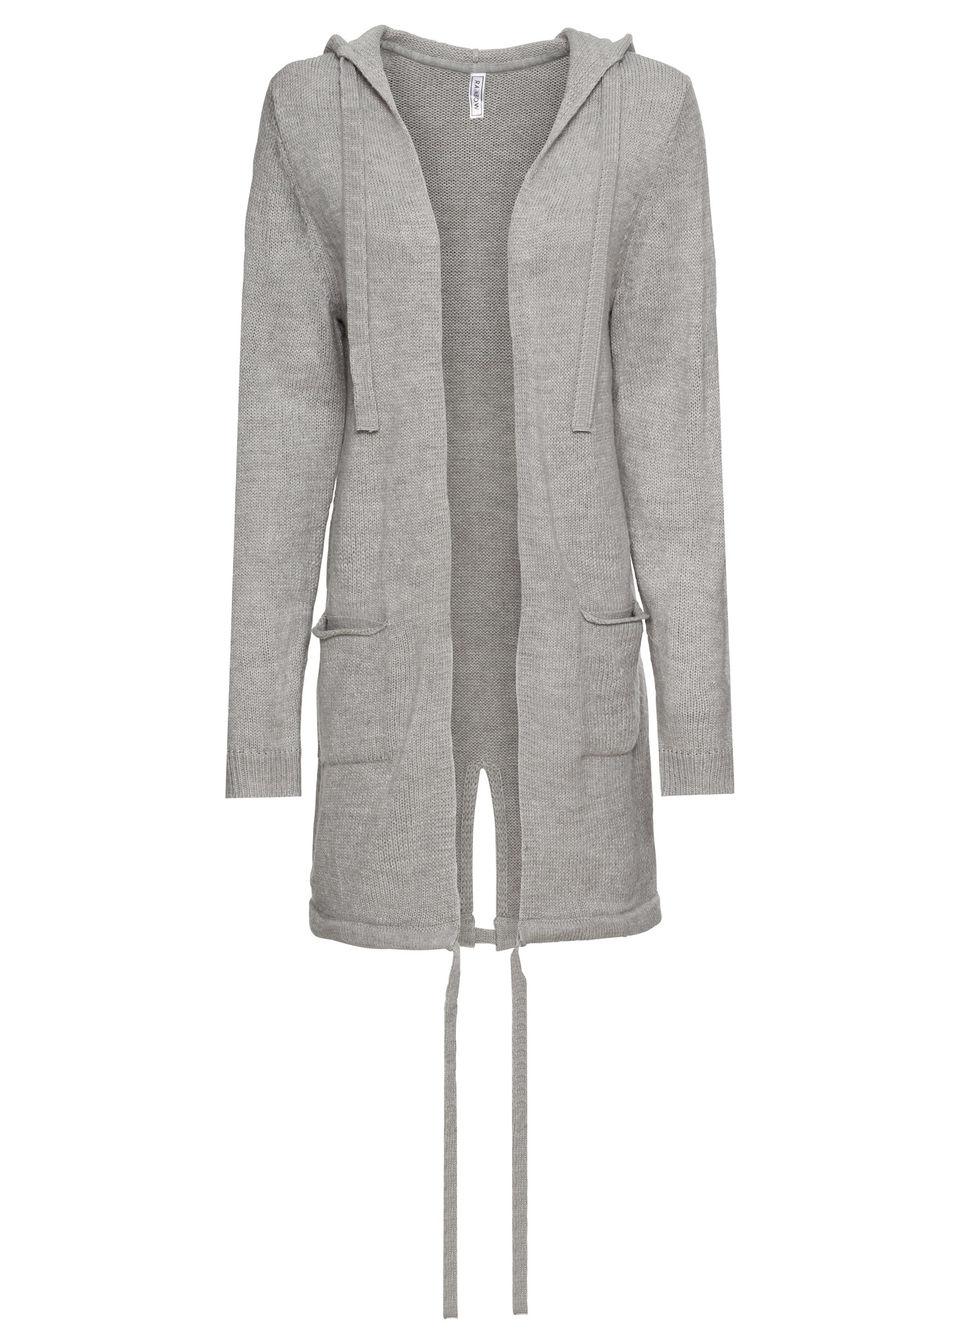 563bb3881056 Pletený sveter s vreckami a kapucňou